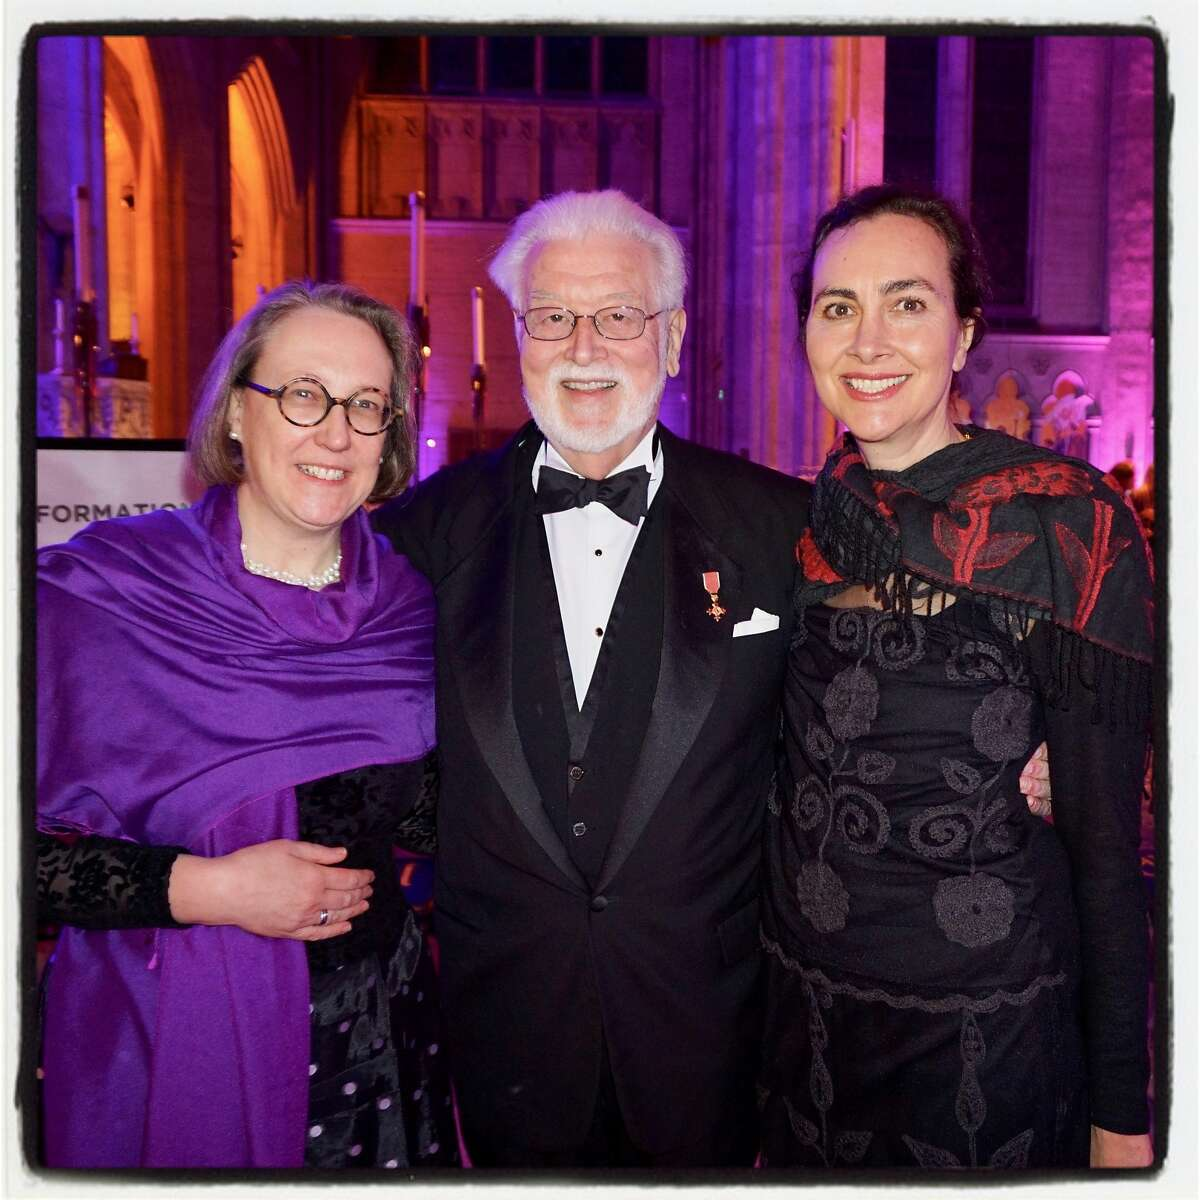 Stanford University Religious Studies Dean Jane Shaw (left) with former Grace Dean Alan Jones and her partner, Sarah Ogilvie at Carnivale. Feb. 13, 2018.